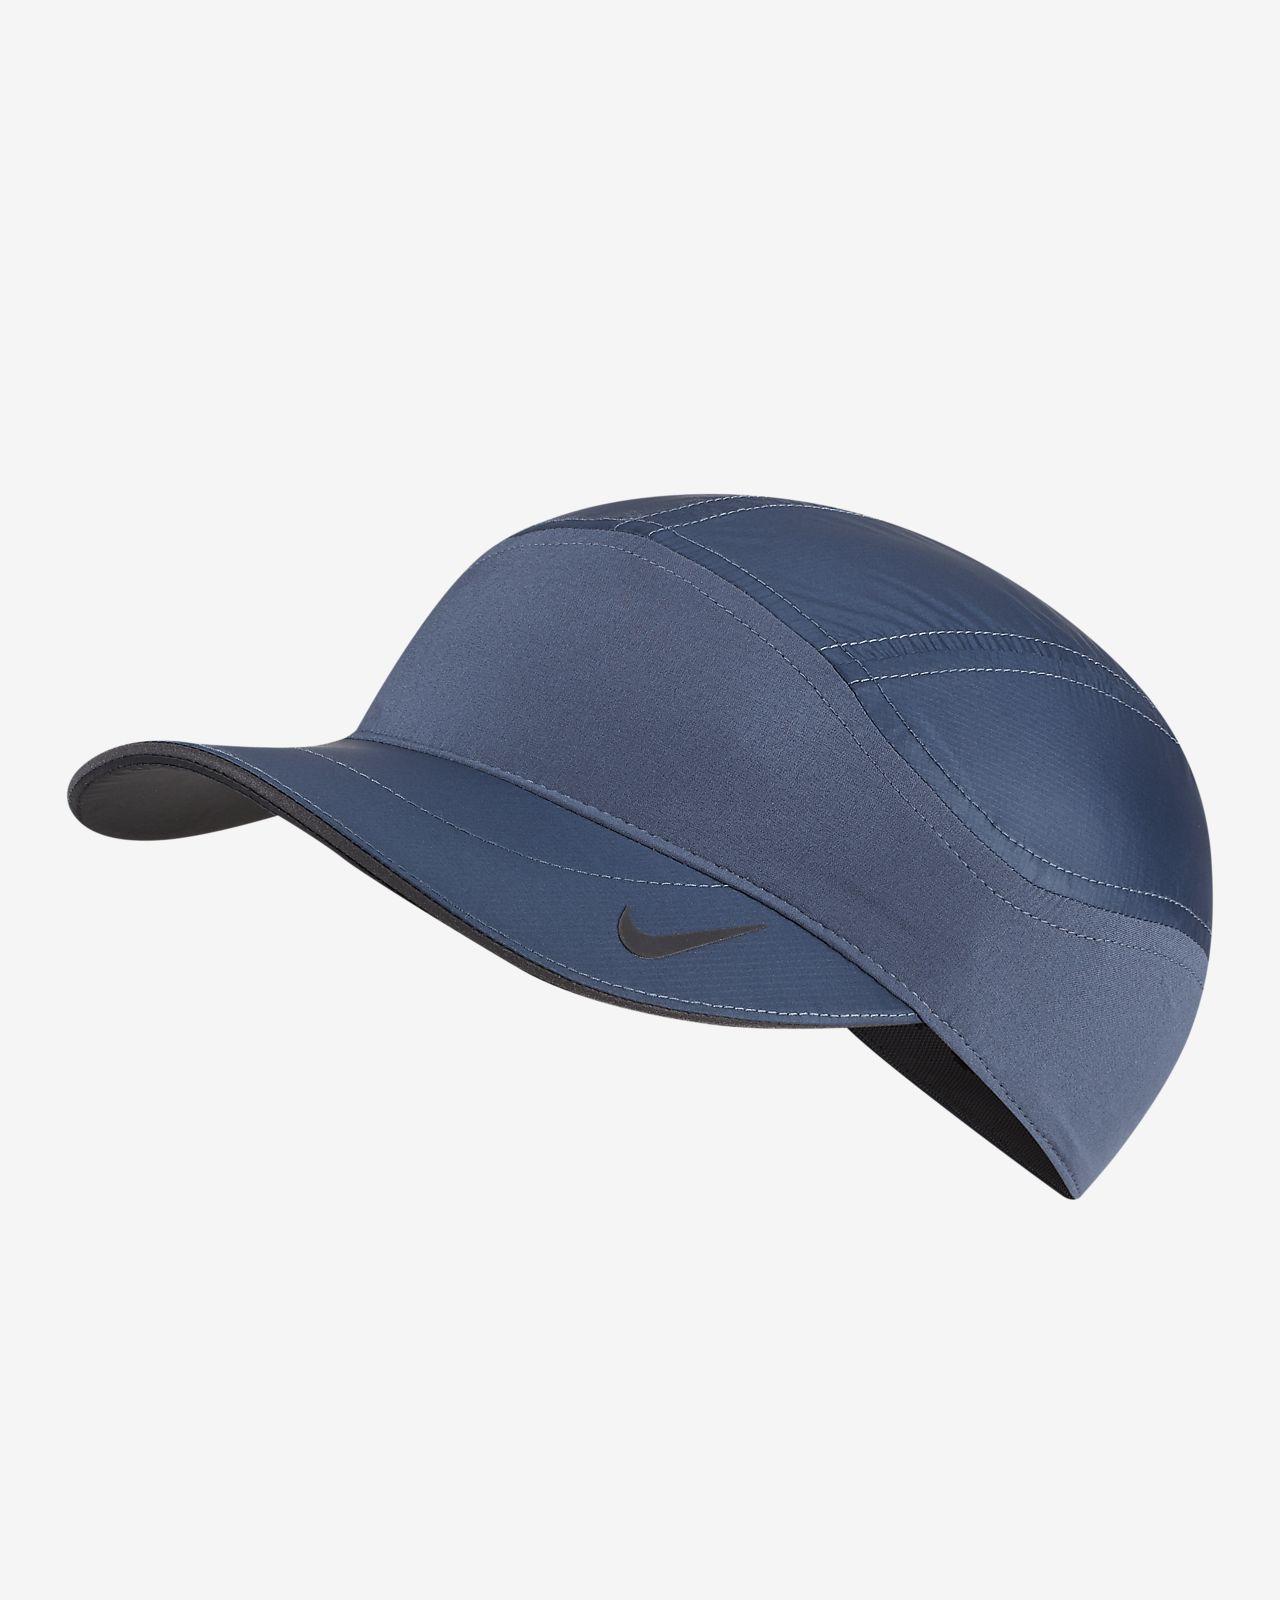 Nike Tailwind verstellbare Laufcap